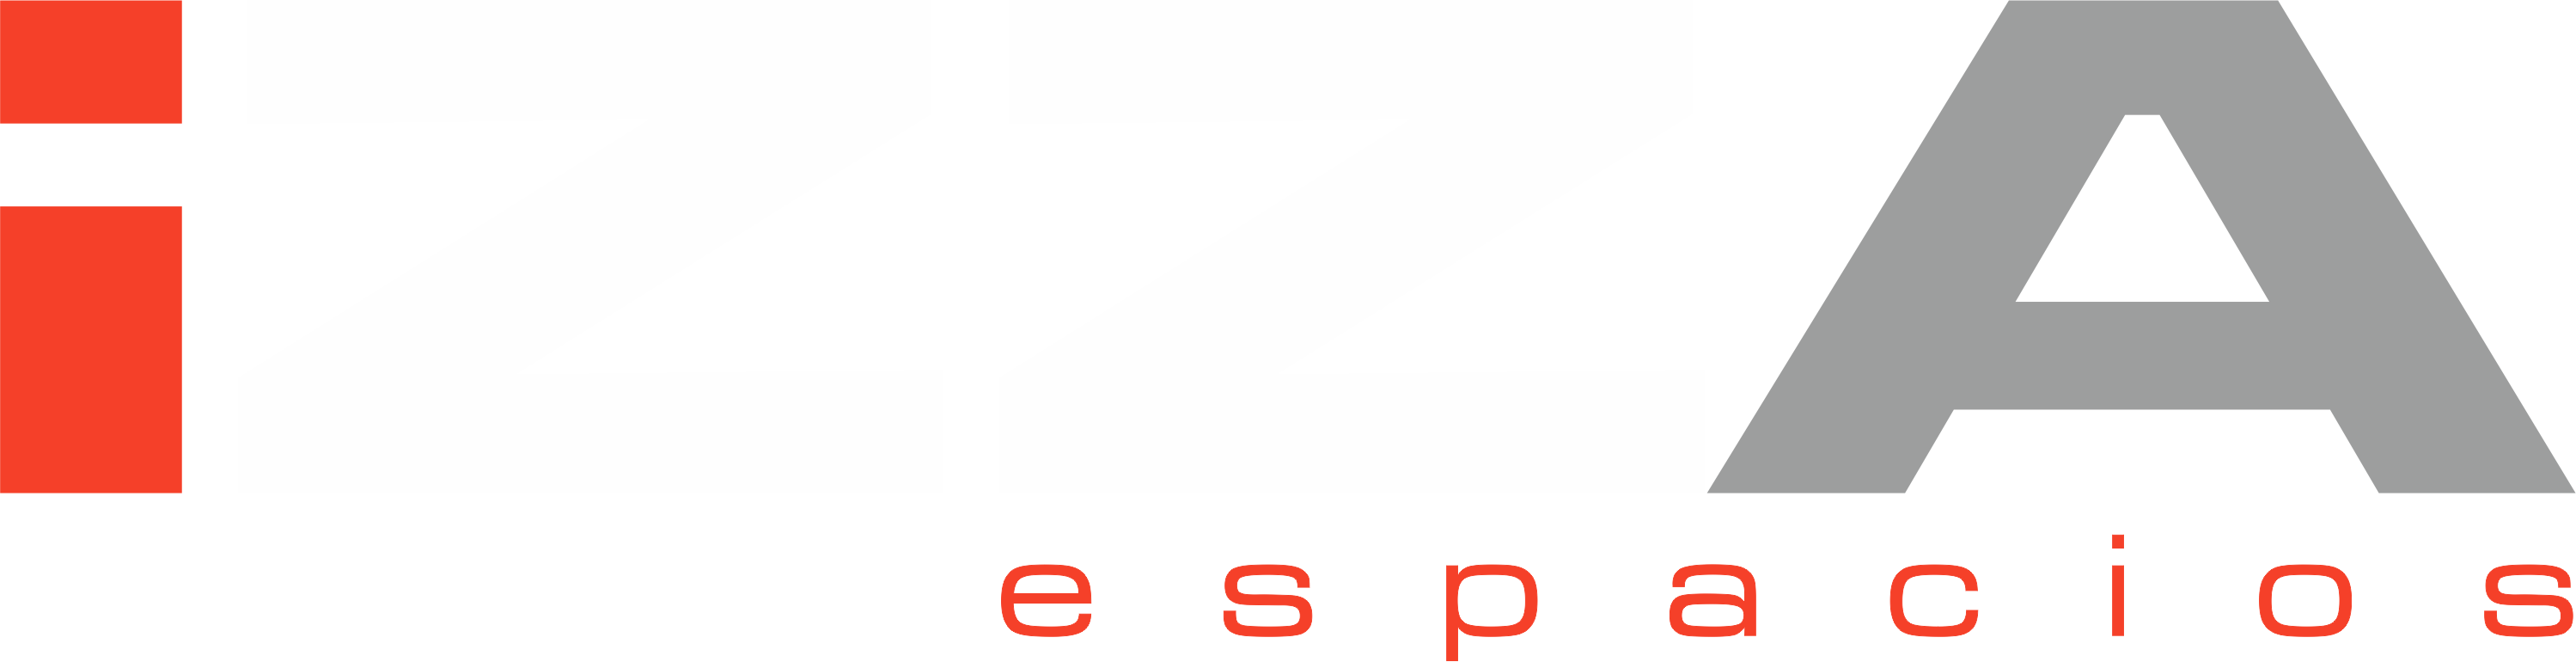 //socialyseo.es/wp-content/uploads/2018/03/client_3.jpg